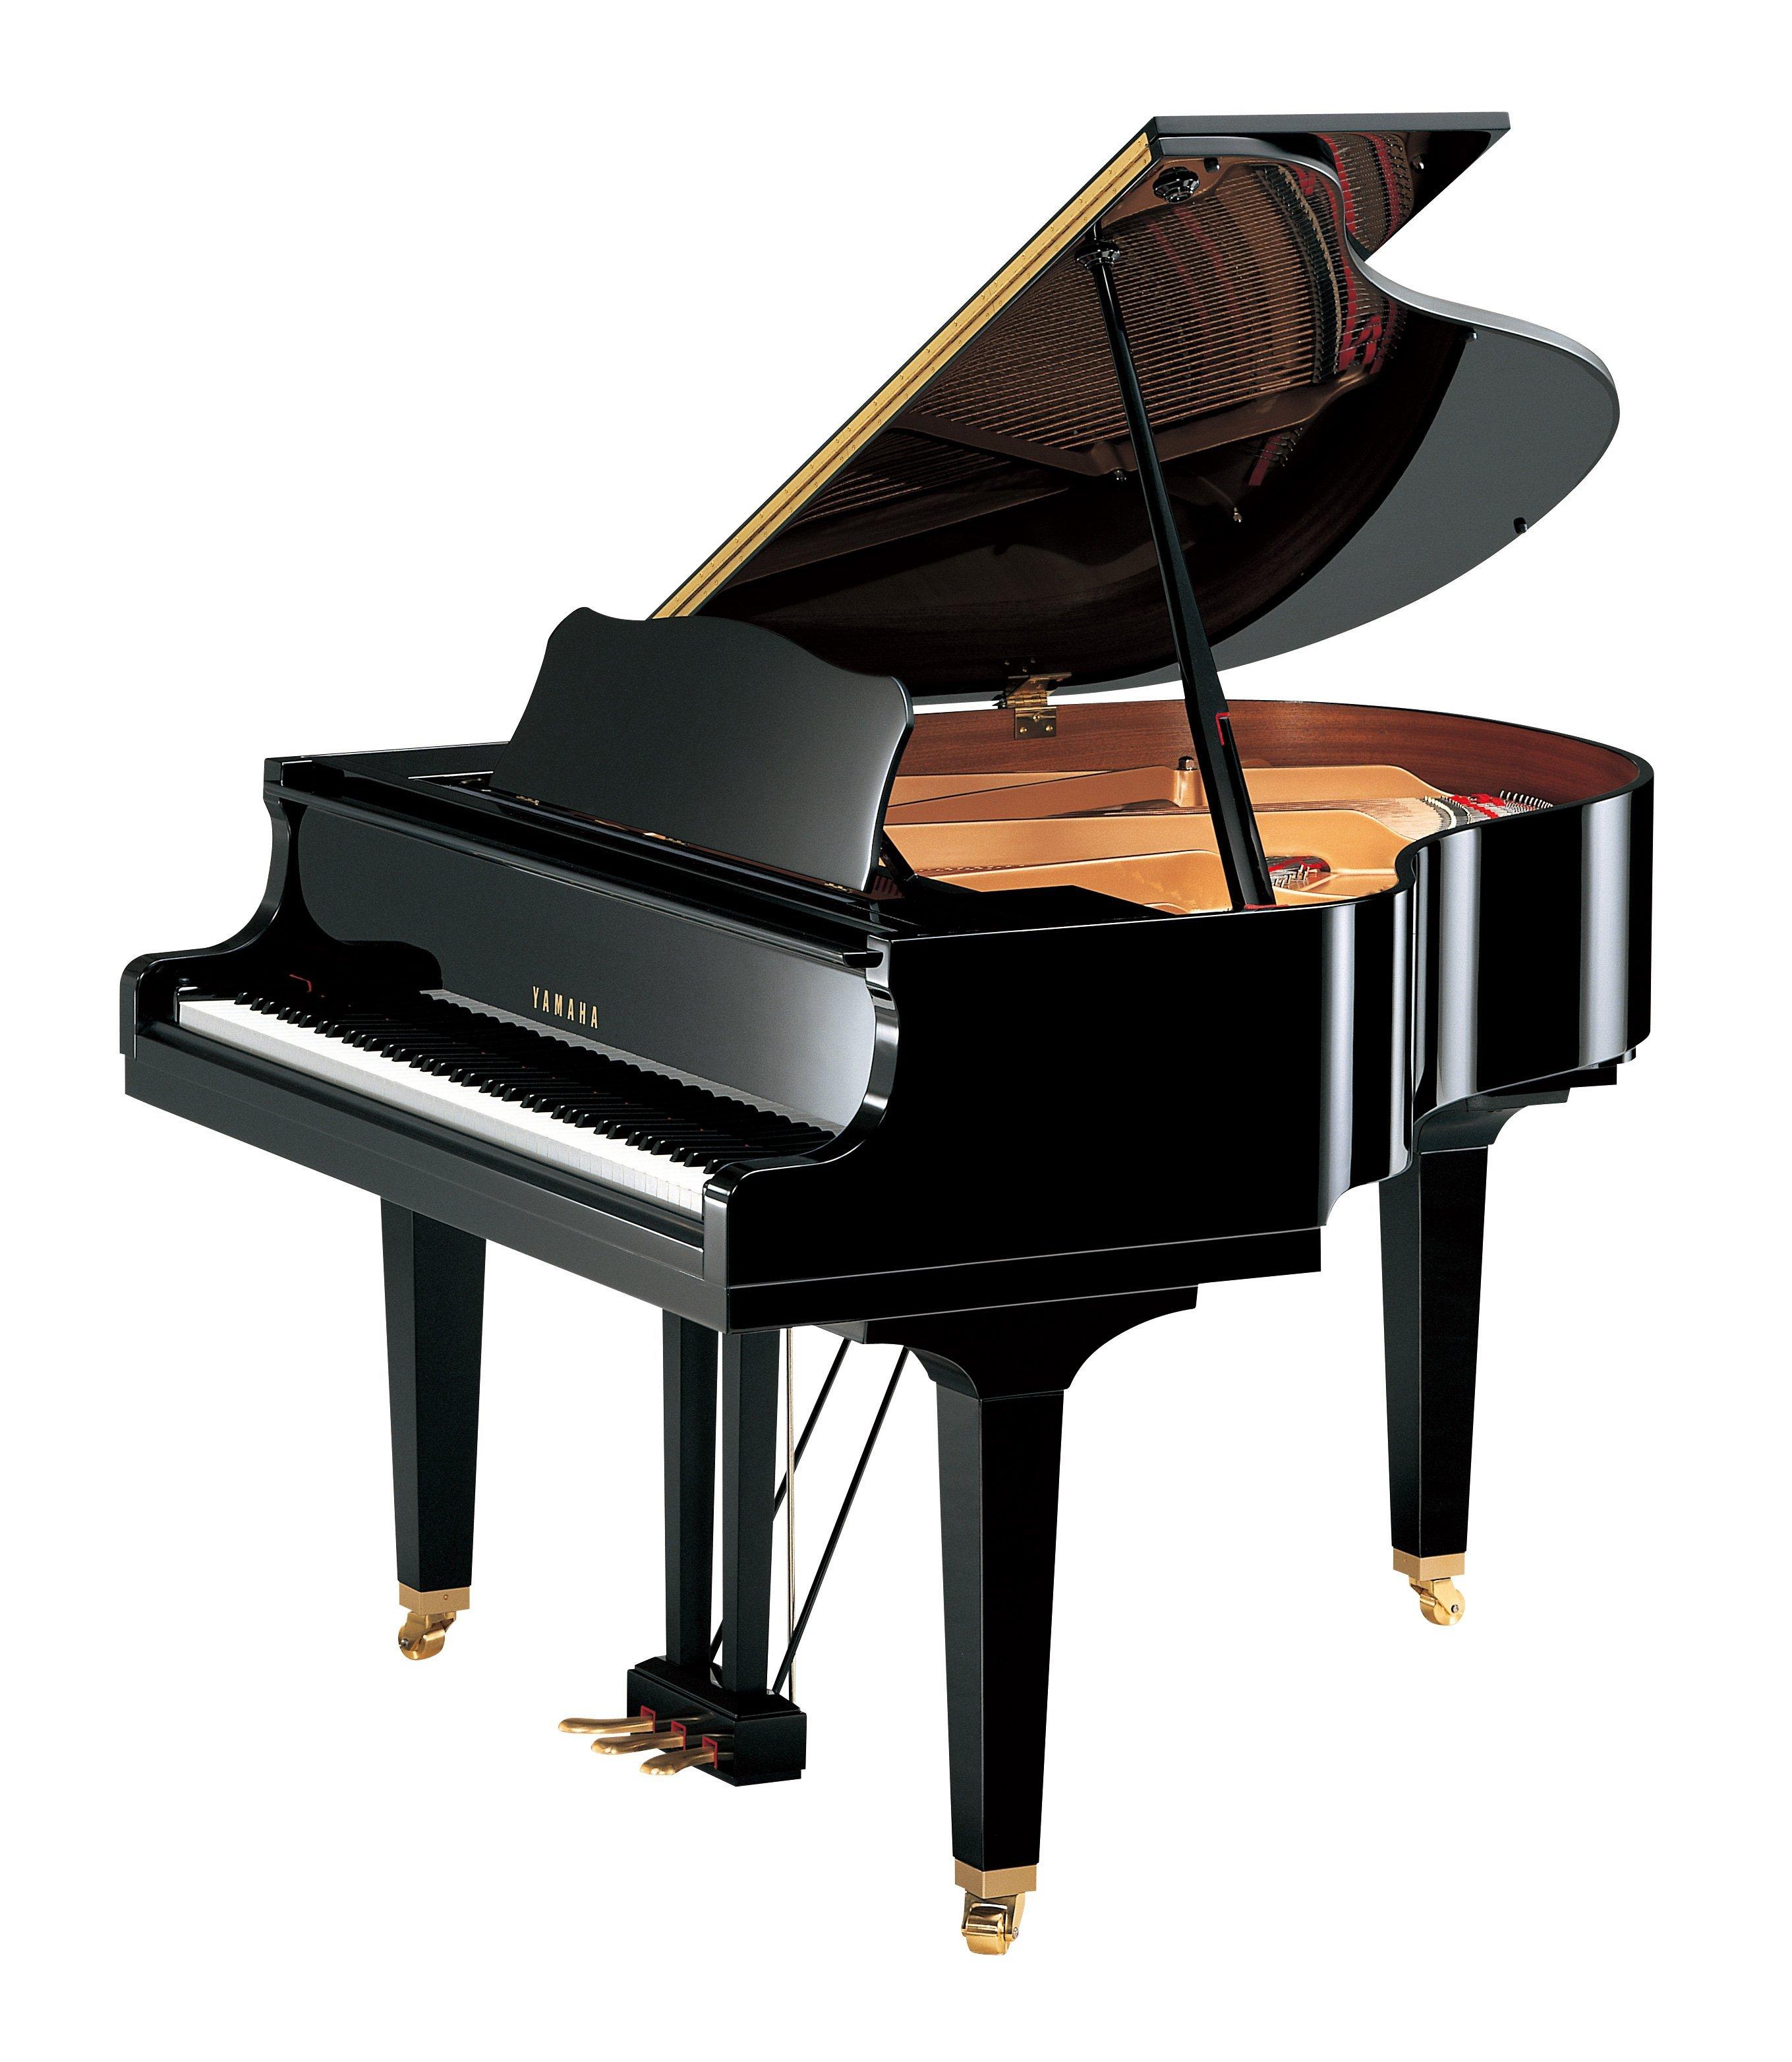 gb1 pr sentation pianos queue les pianos. Black Bedroom Furniture Sets. Home Design Ideas